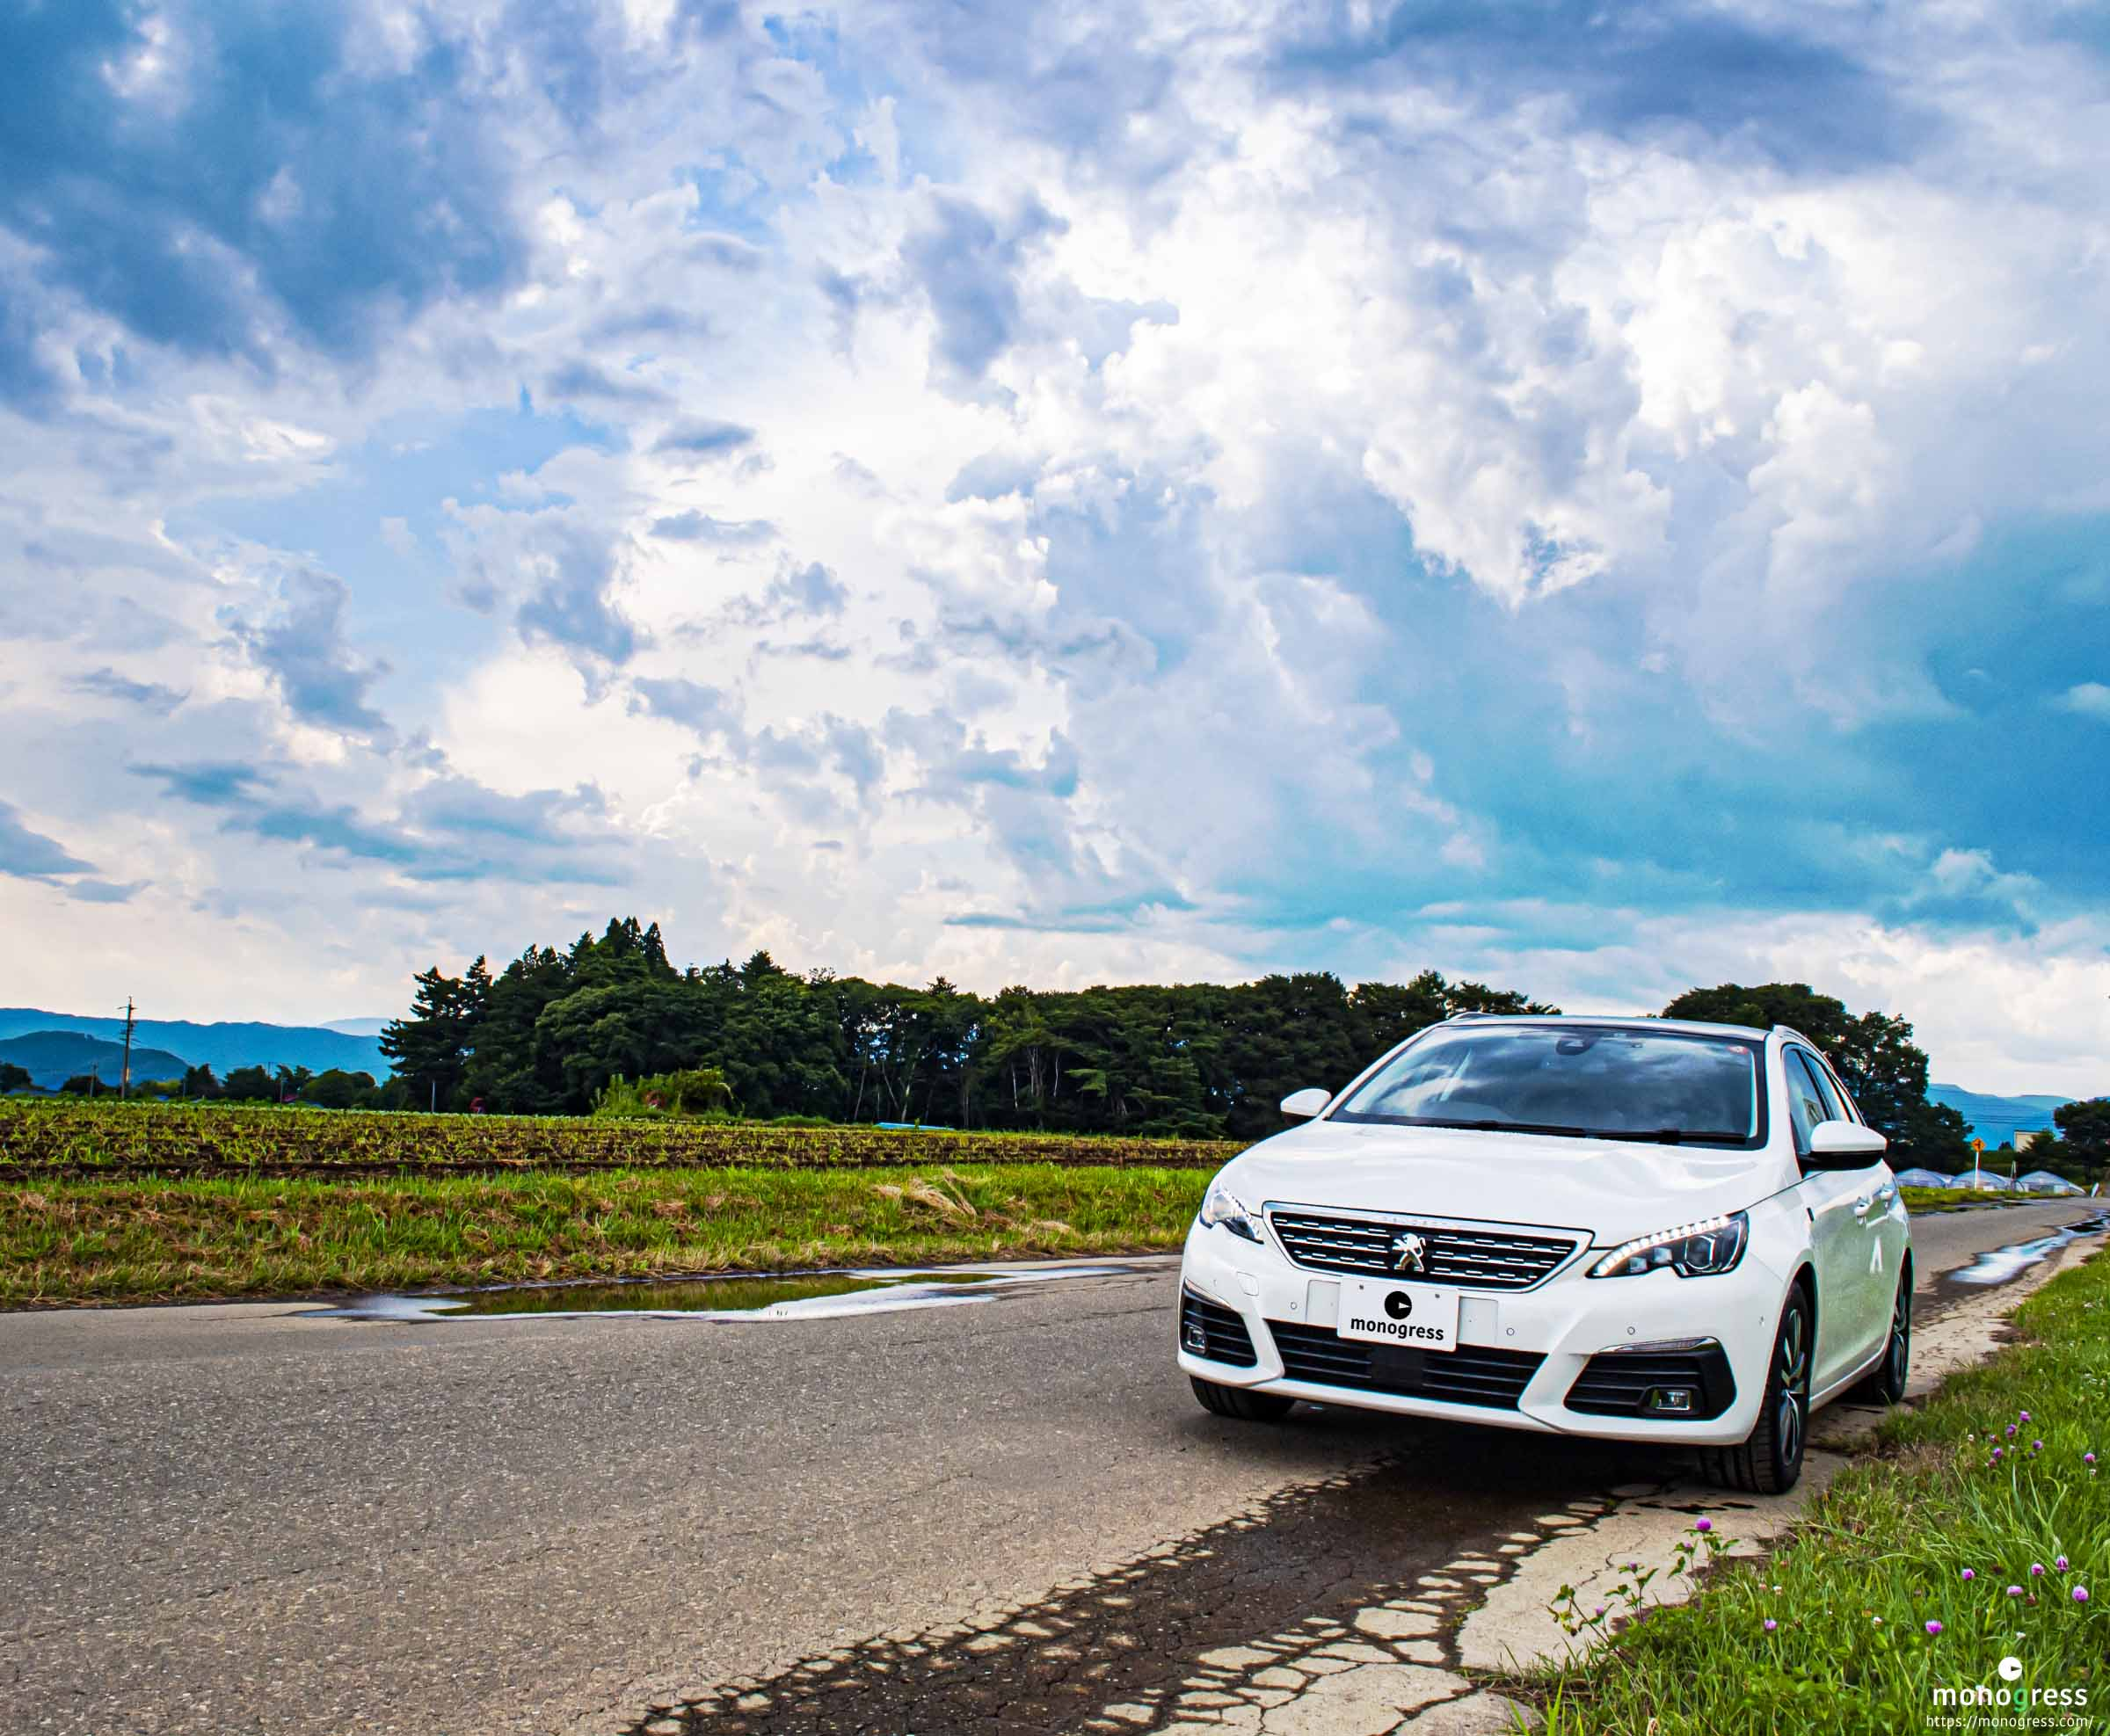 Peugeot 308 と田園風景